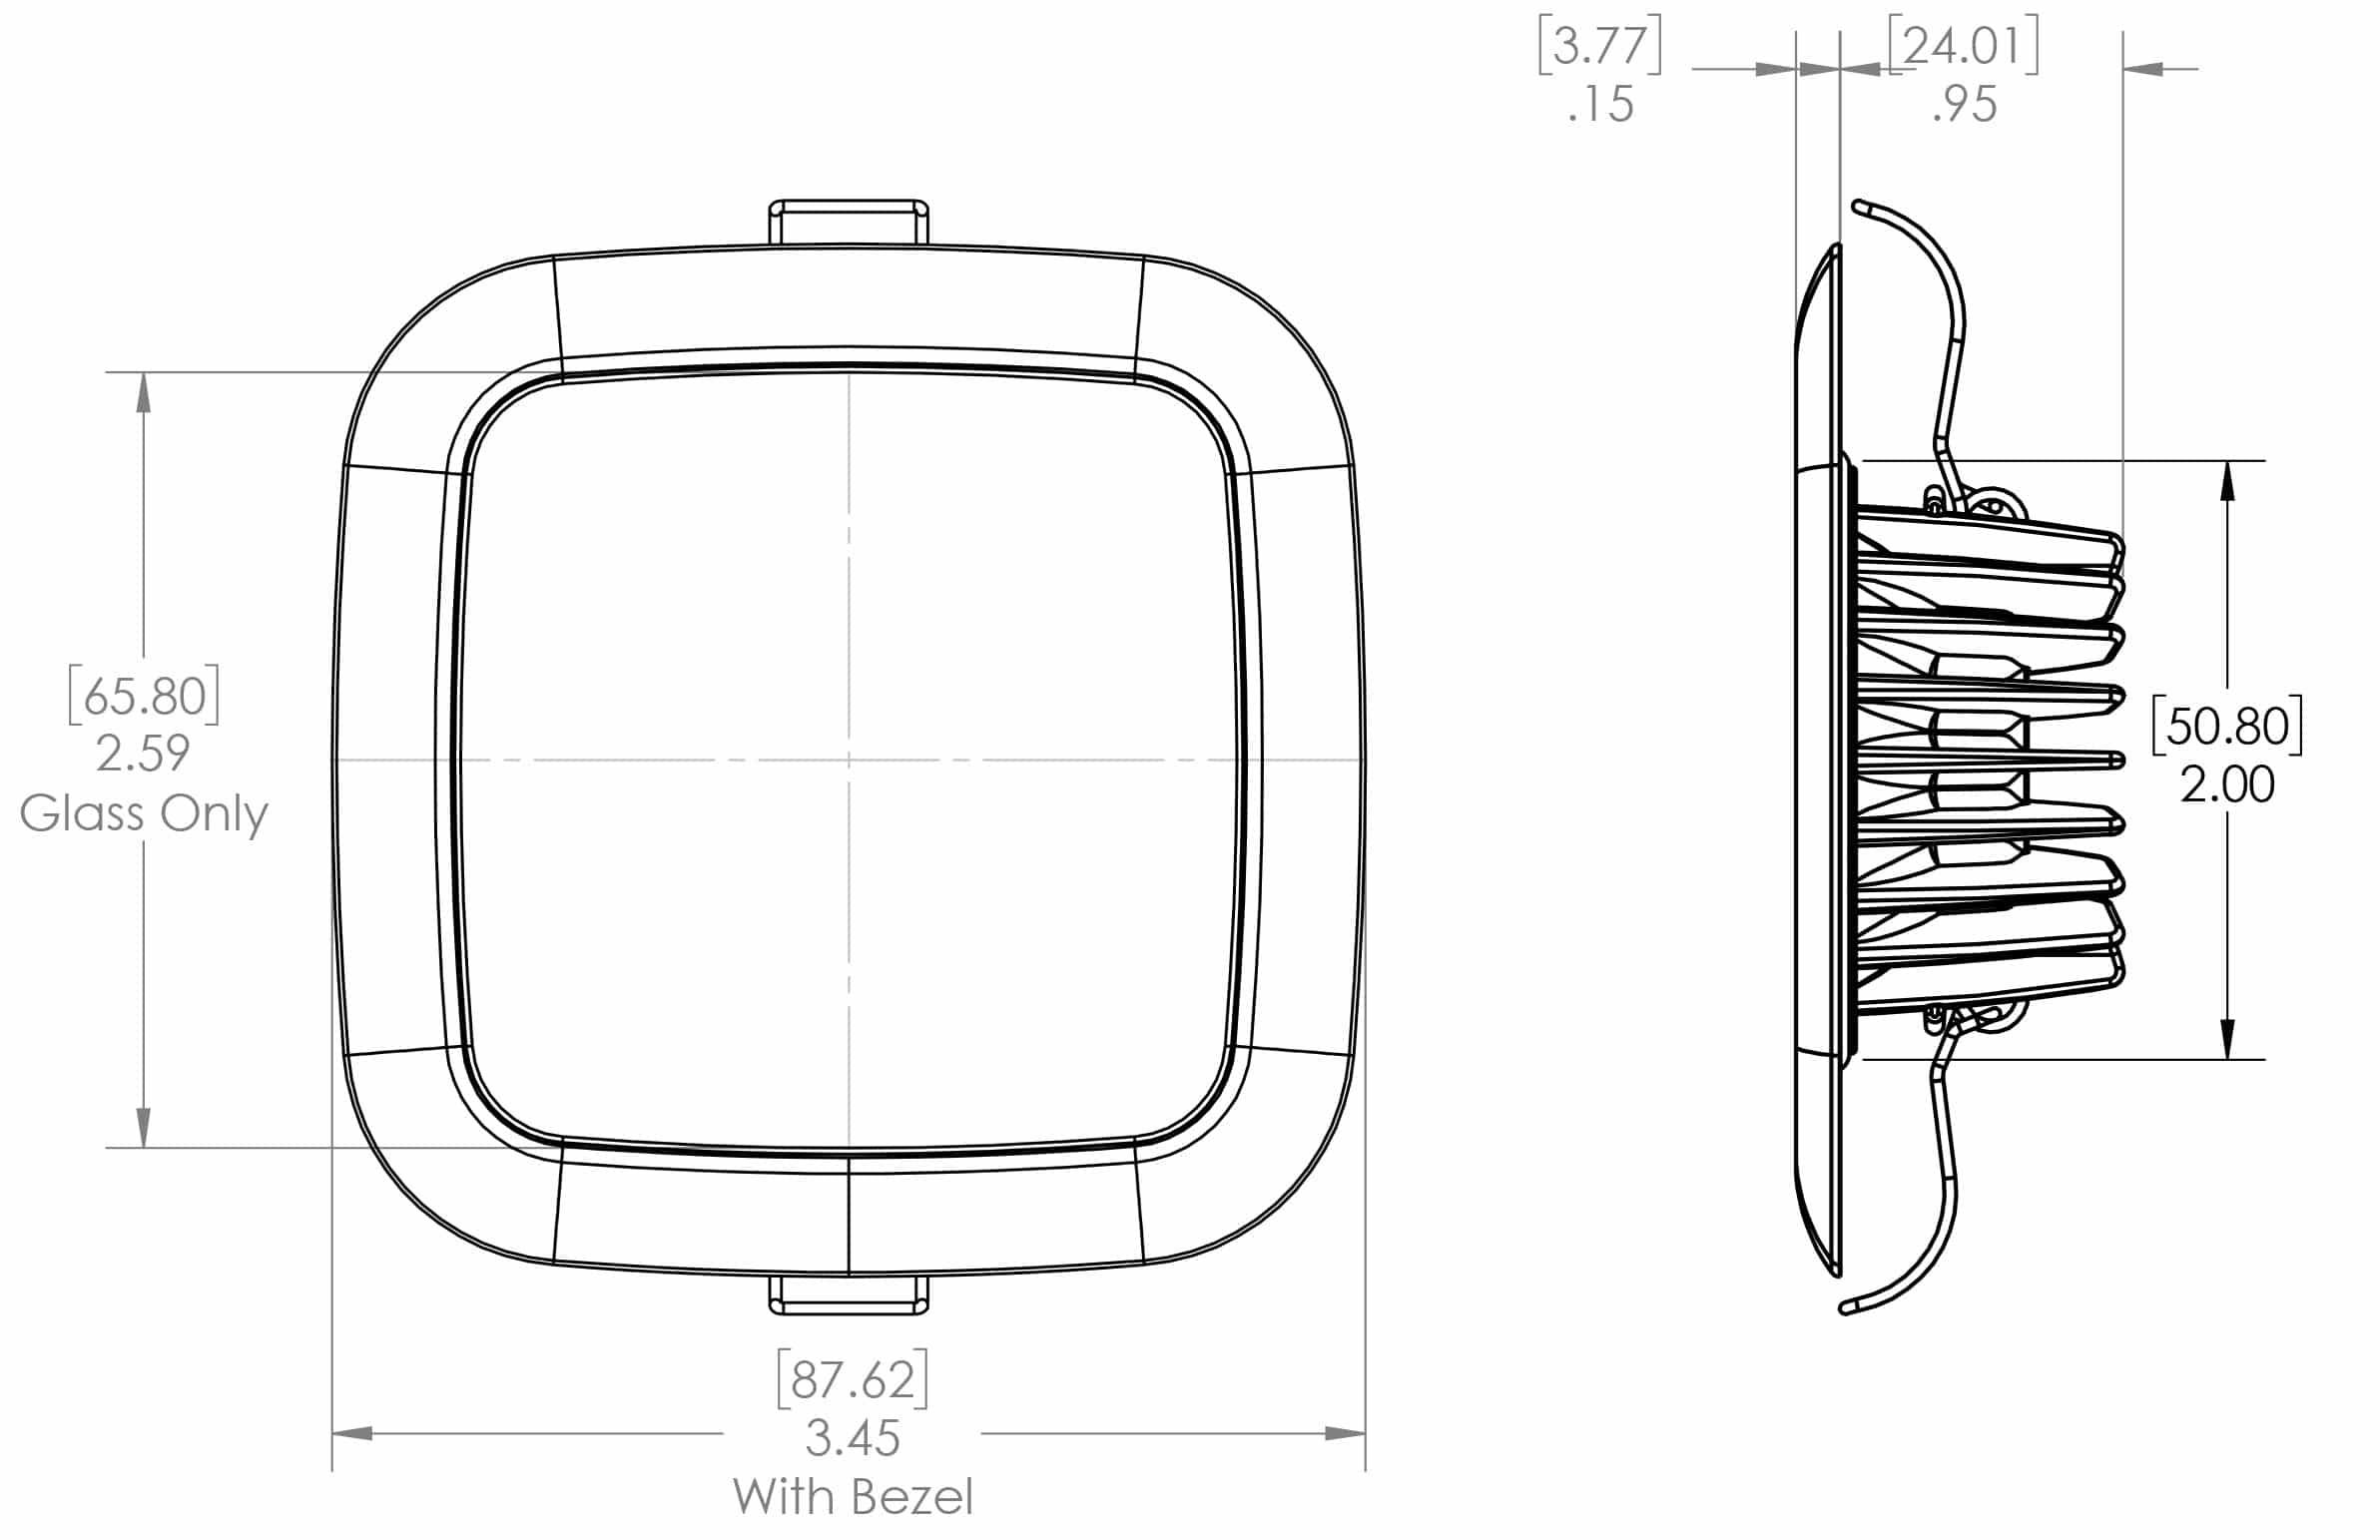 square-mirage-web-drawing.jpg